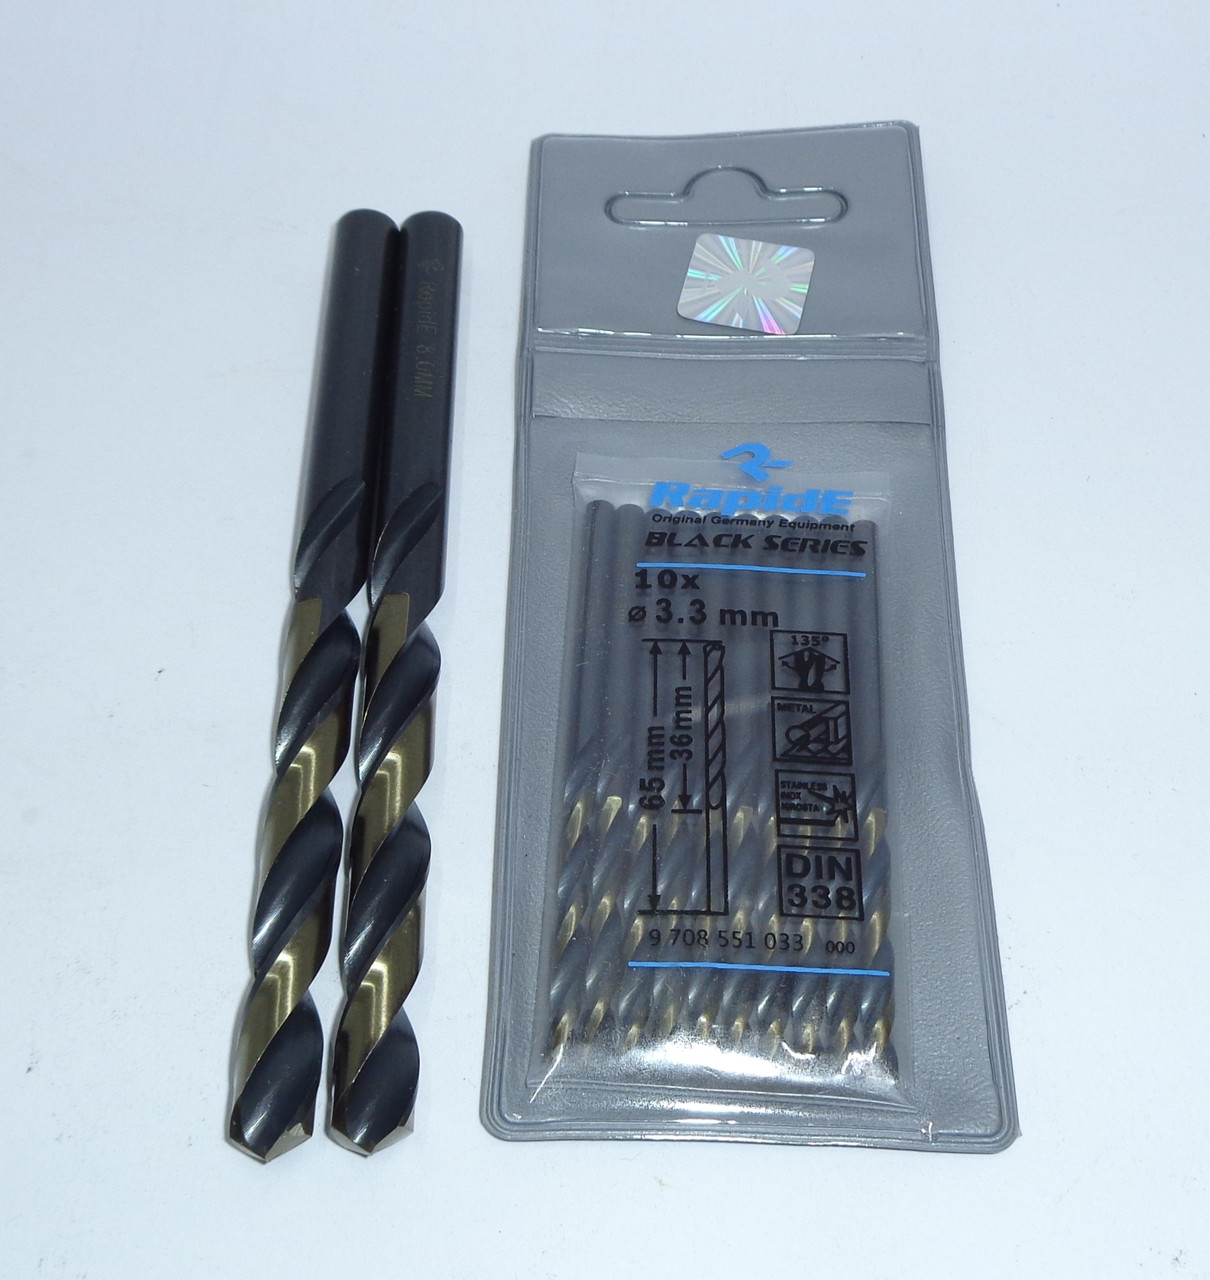 Свердло по металу Діаметром 7 мм RapidE Blask Series